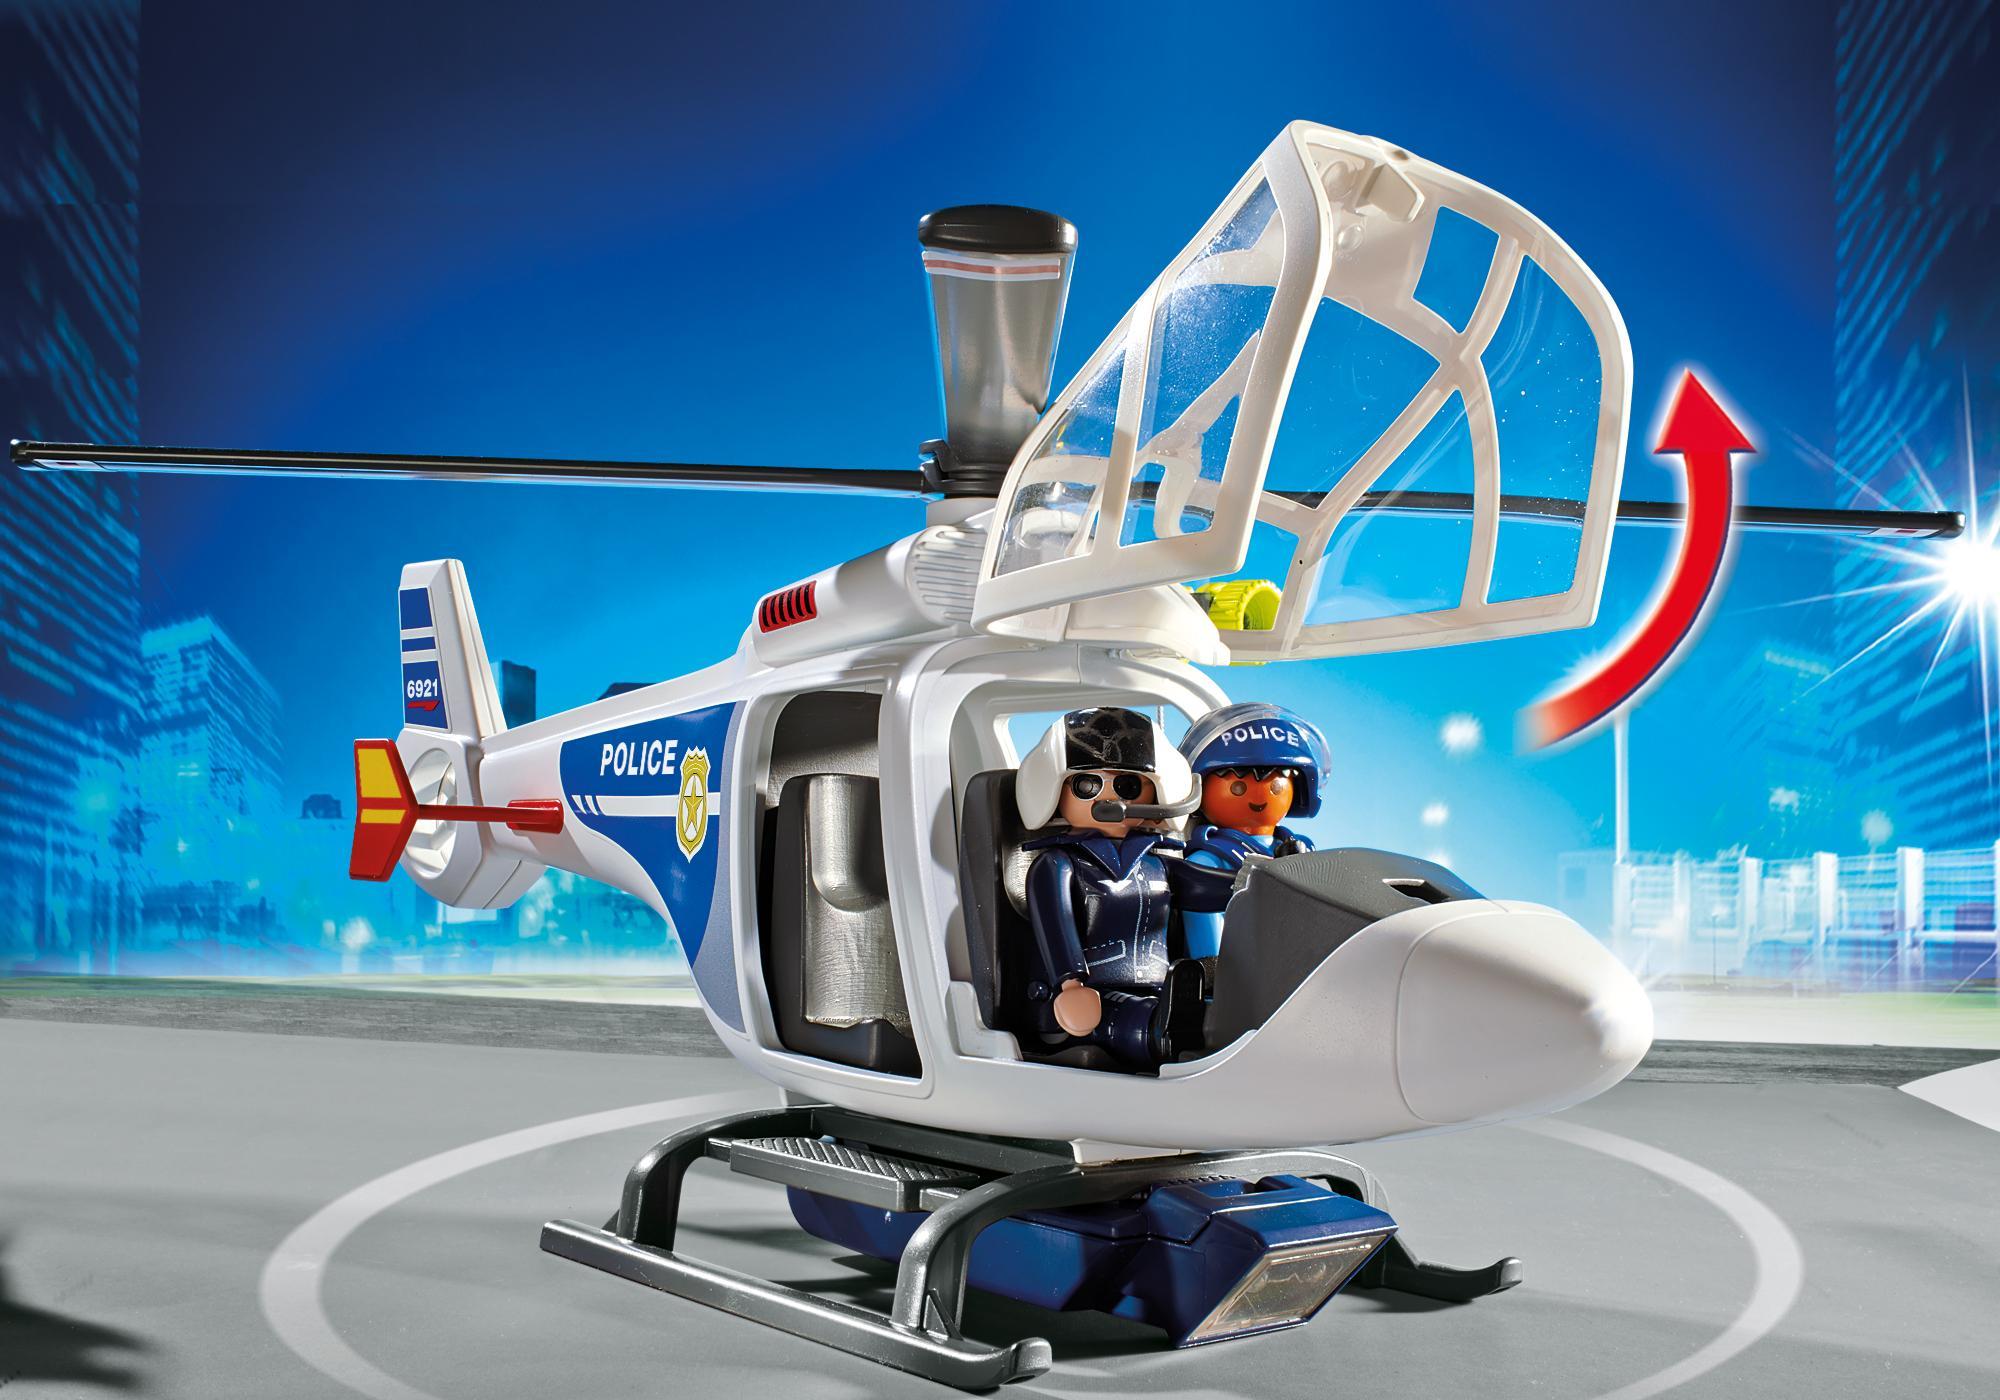 http://media.playmobil.com/i/playmobil/6921_product_extra1/Hélicoptère de police avec projecteur de recherche